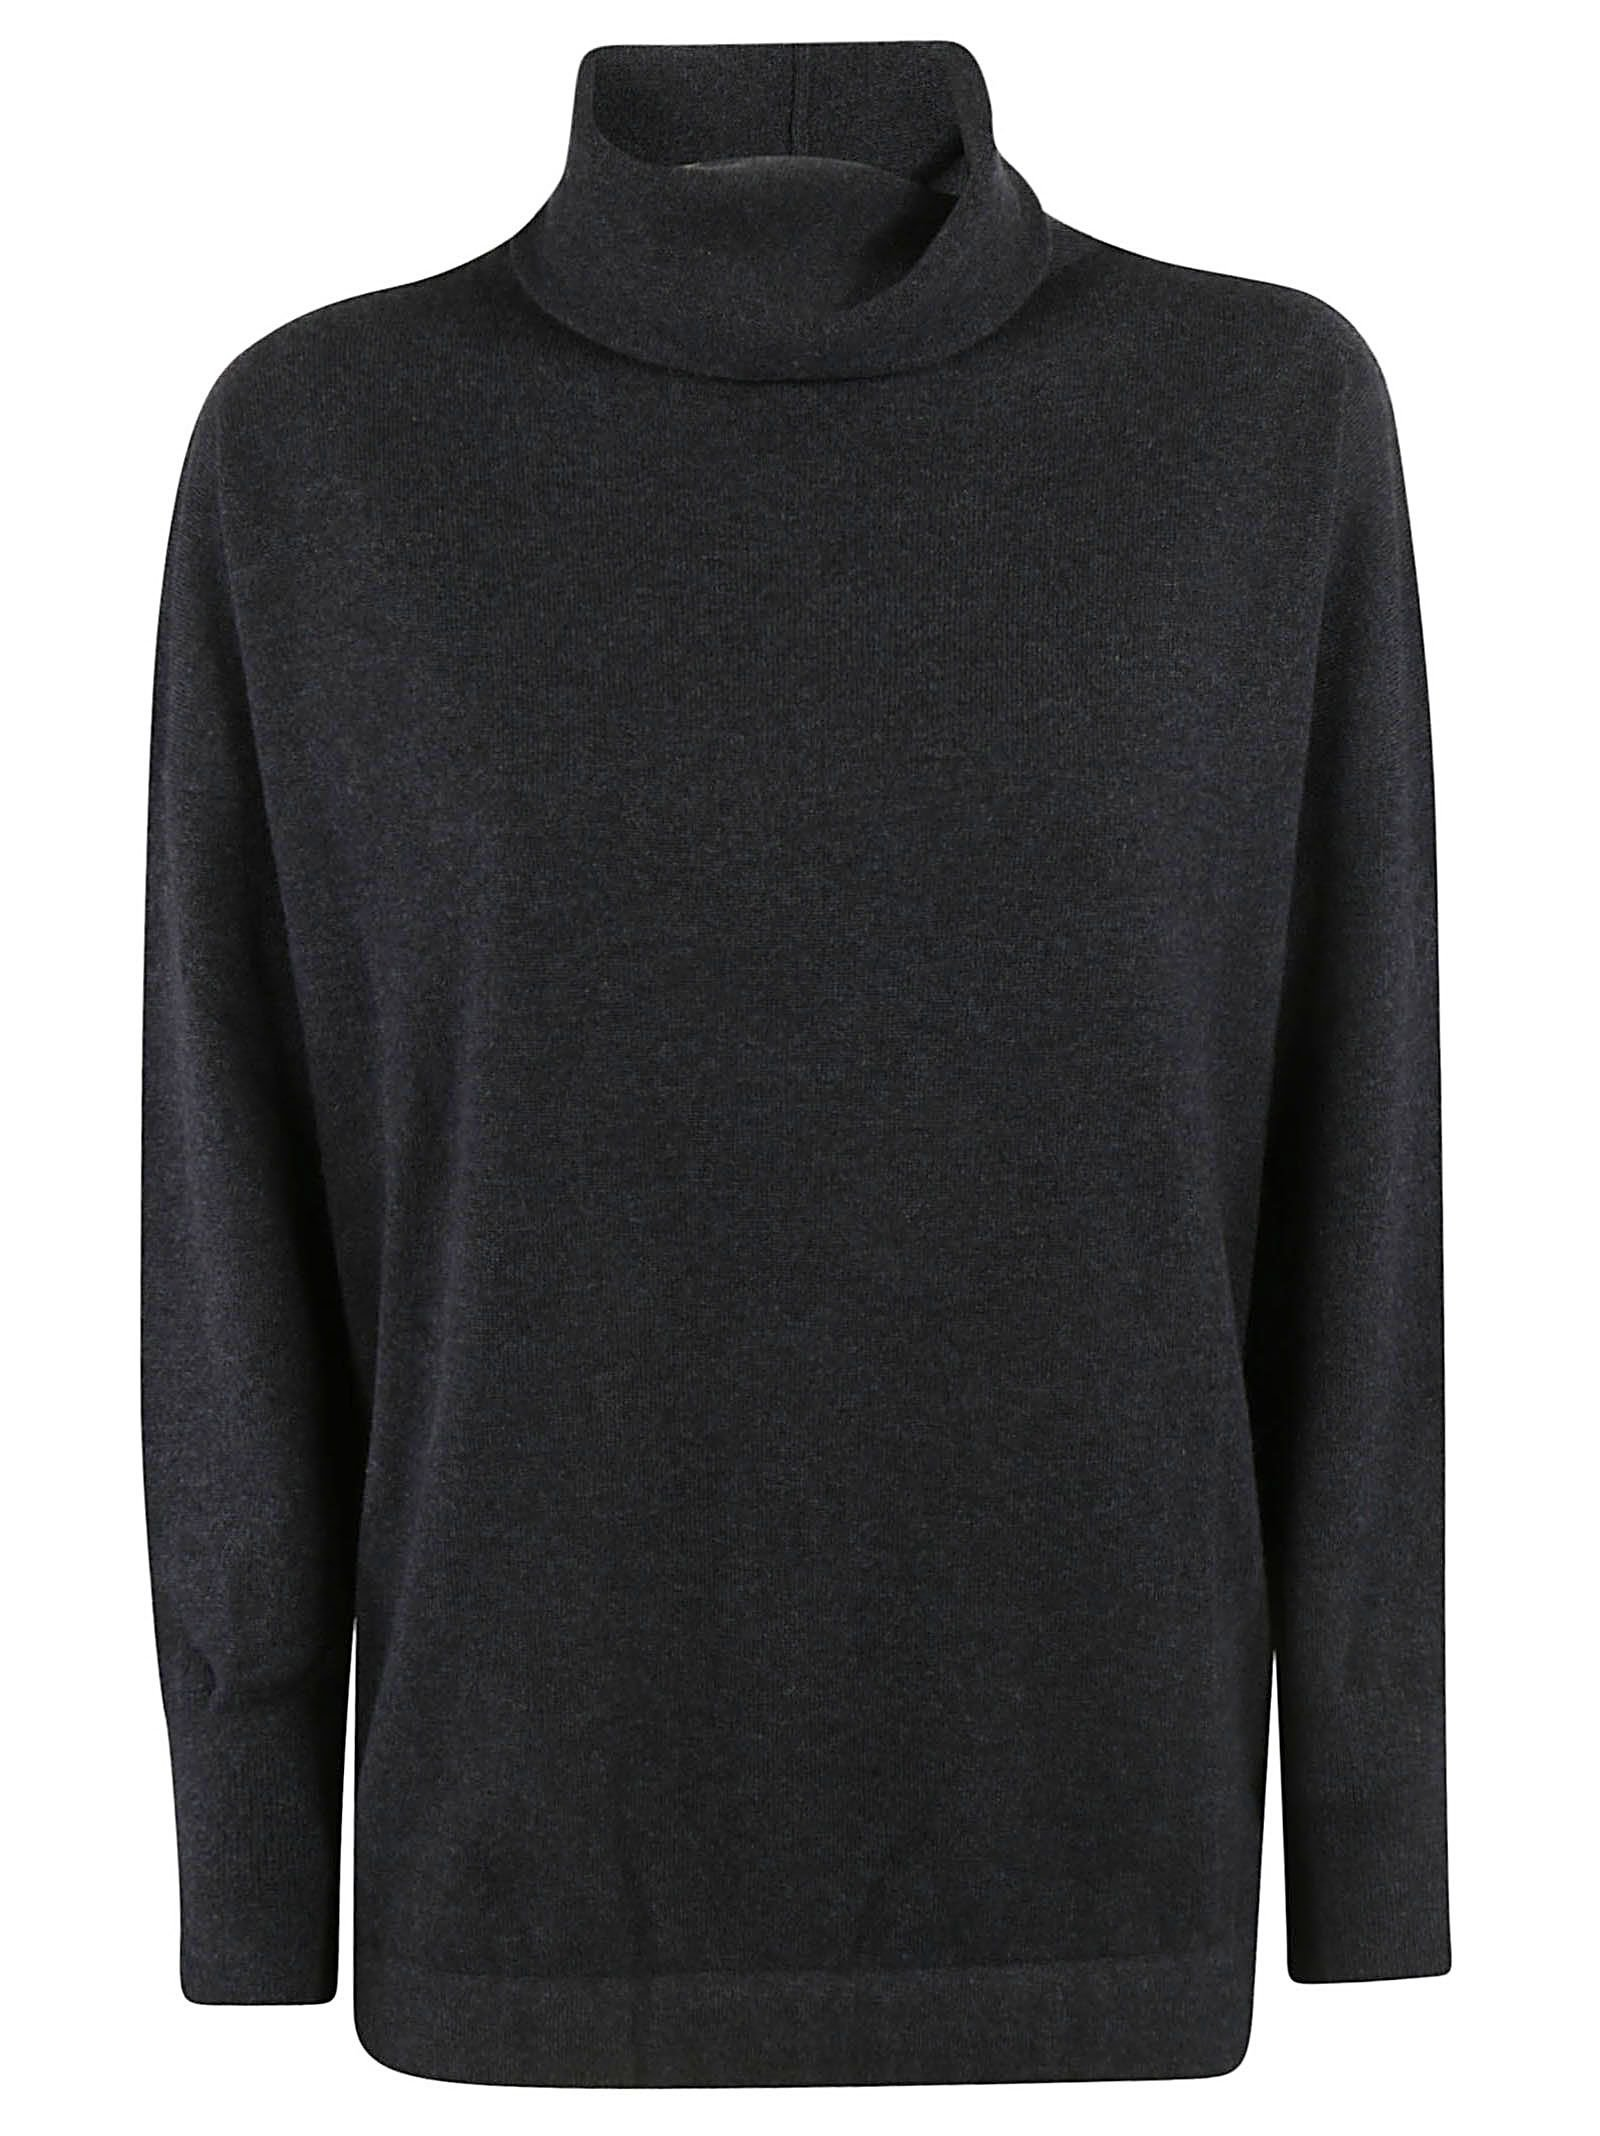 Fabiana Filippi Classic Sweater